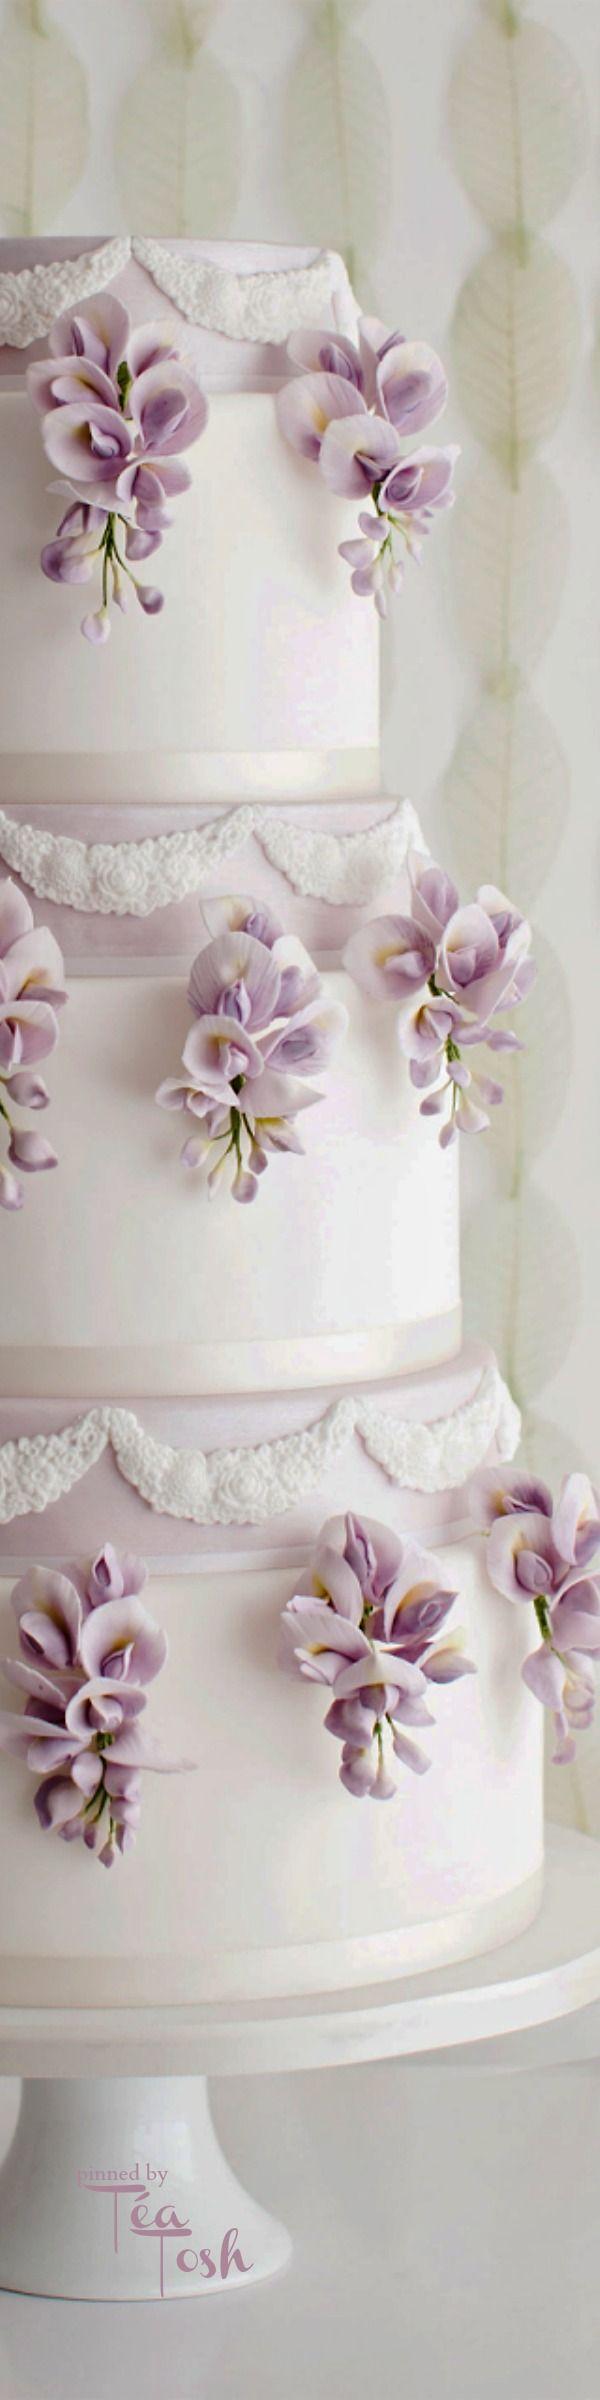 Lilac wedding decoration ideas   best Stephanie images on Pinterest  Feminine fashion My style